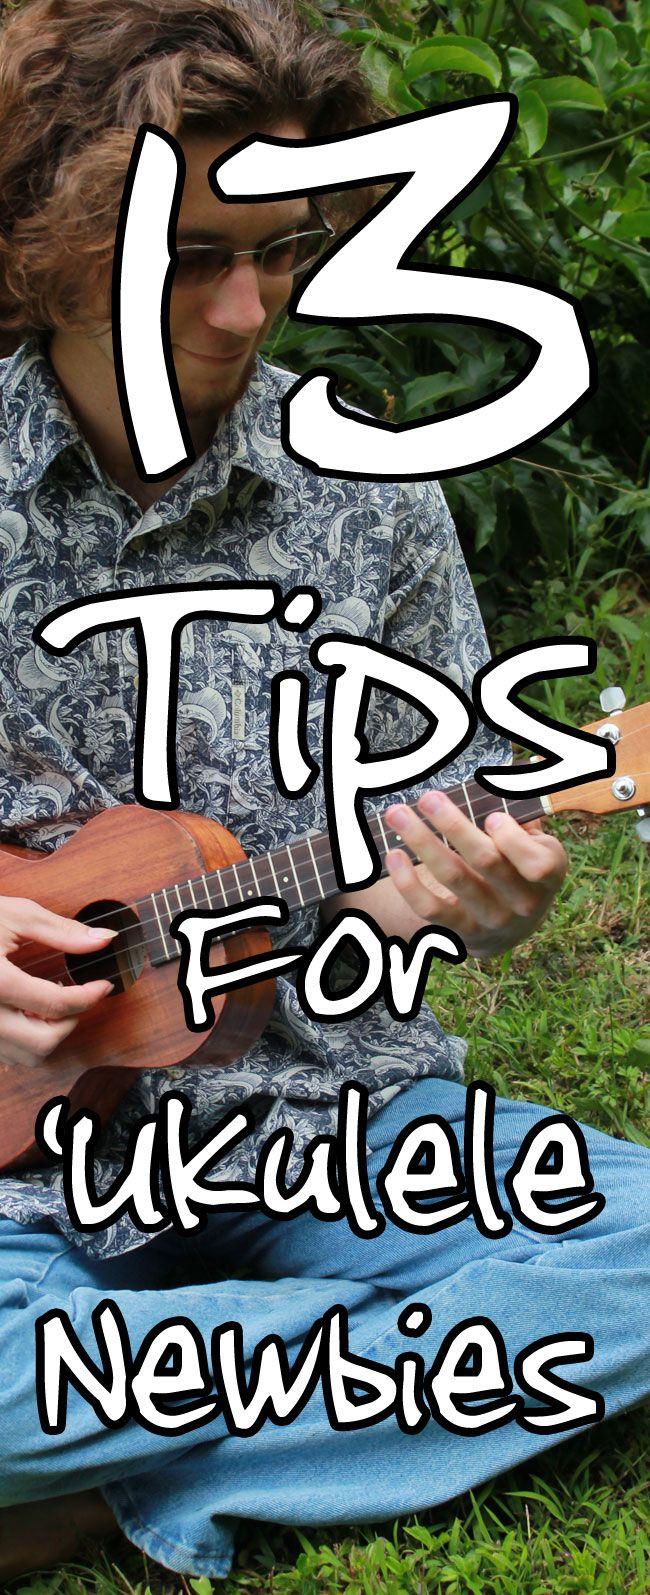 39 ukulele for beginners basic lessons ukulele ukelele musica y aula de m sica. Black Bedroom Furniture Sets. Home Design Ideas